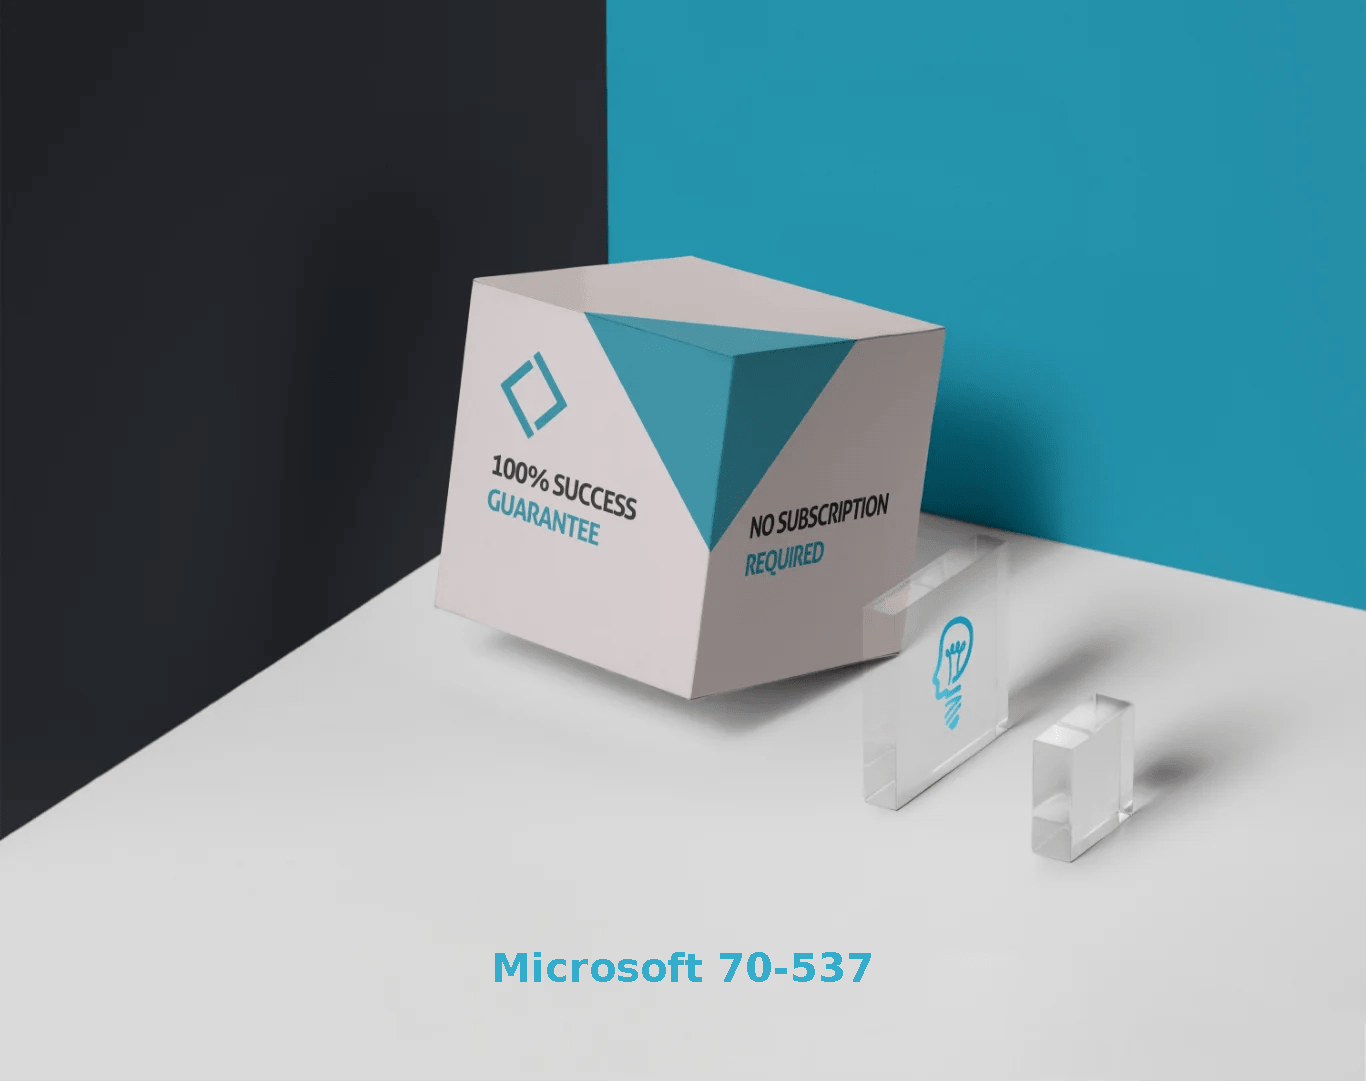 Microsoft 70-537 Exams